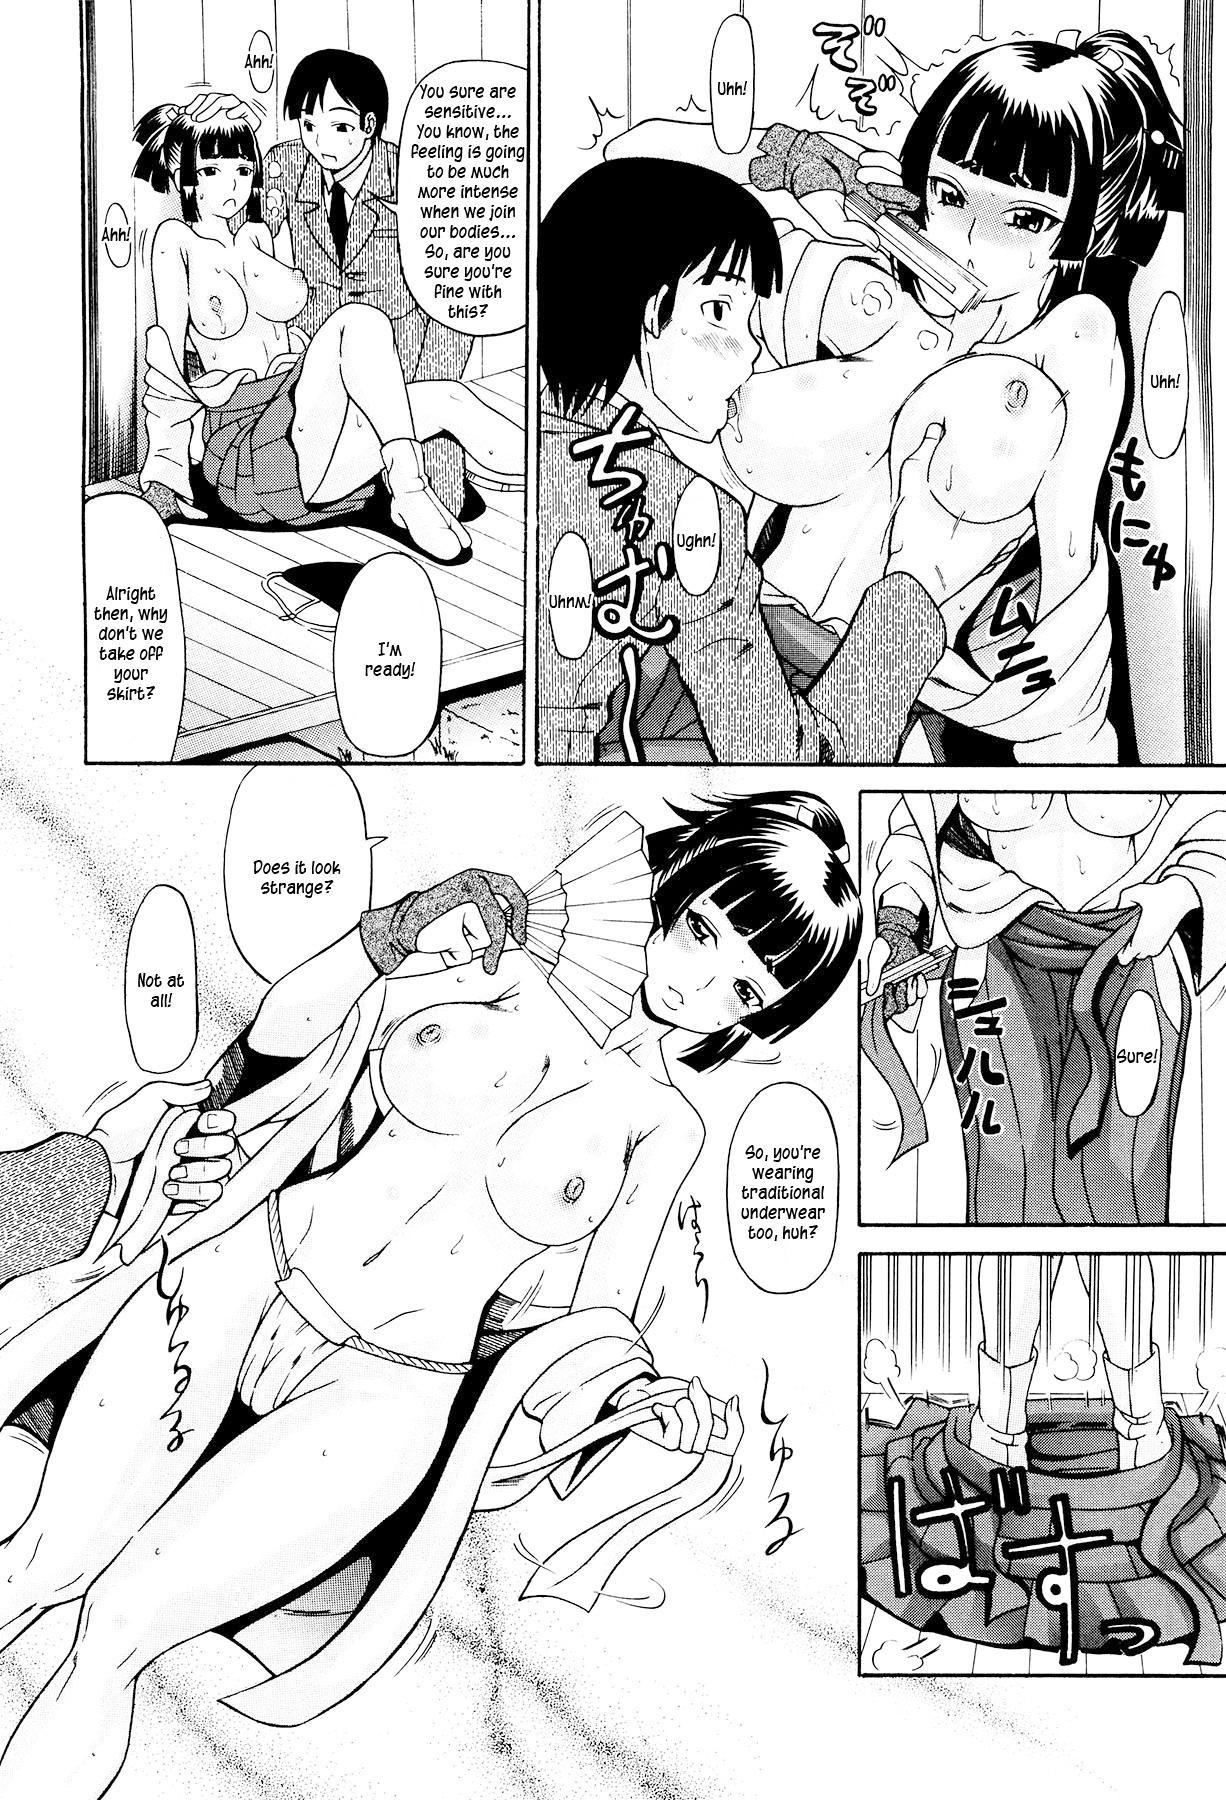 [Ando Hiroyuki] Koisuru Purin-Pai - Pudding-Pai Falling in Love [English] [Kusanyagi, Team Vanilla] 50